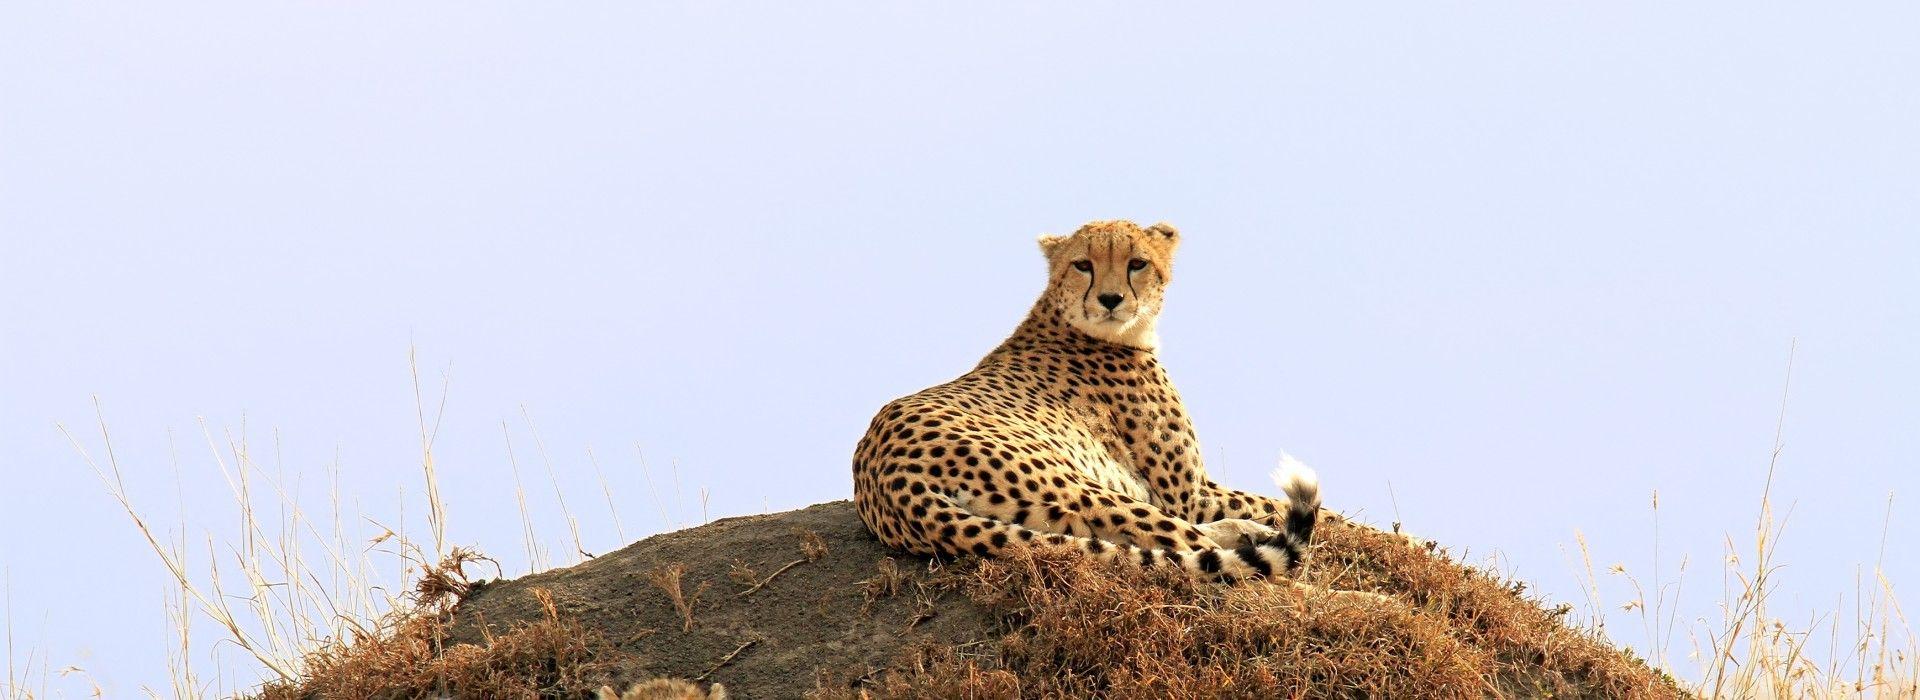 Adventure Tours in Maasai Mara National Reserve